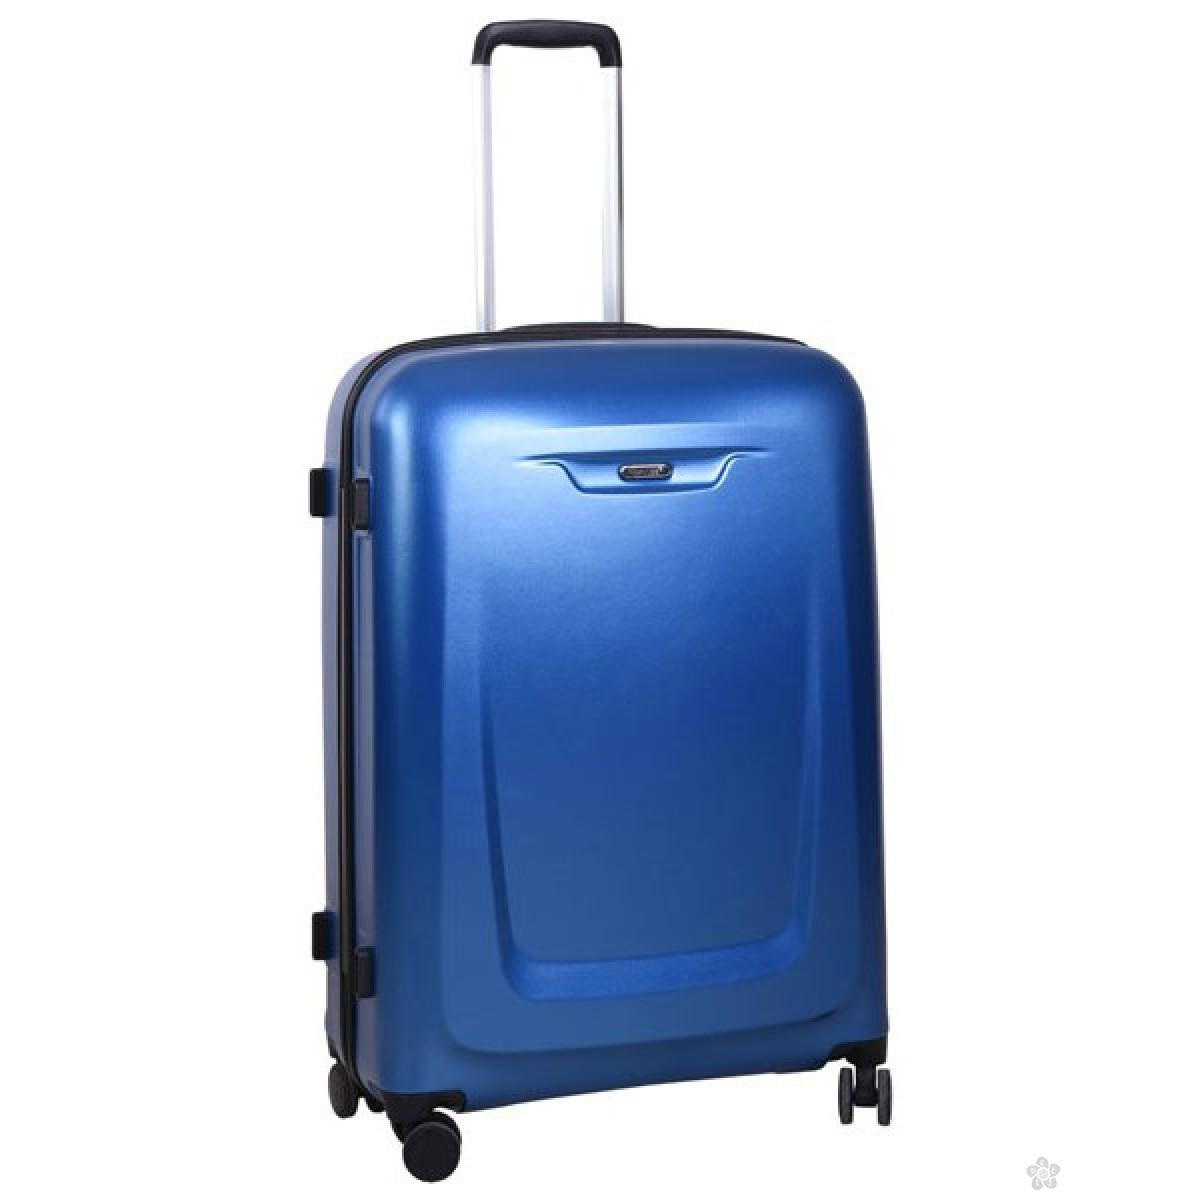 Kofer Pulse Manhattan plavi 28inch X21155